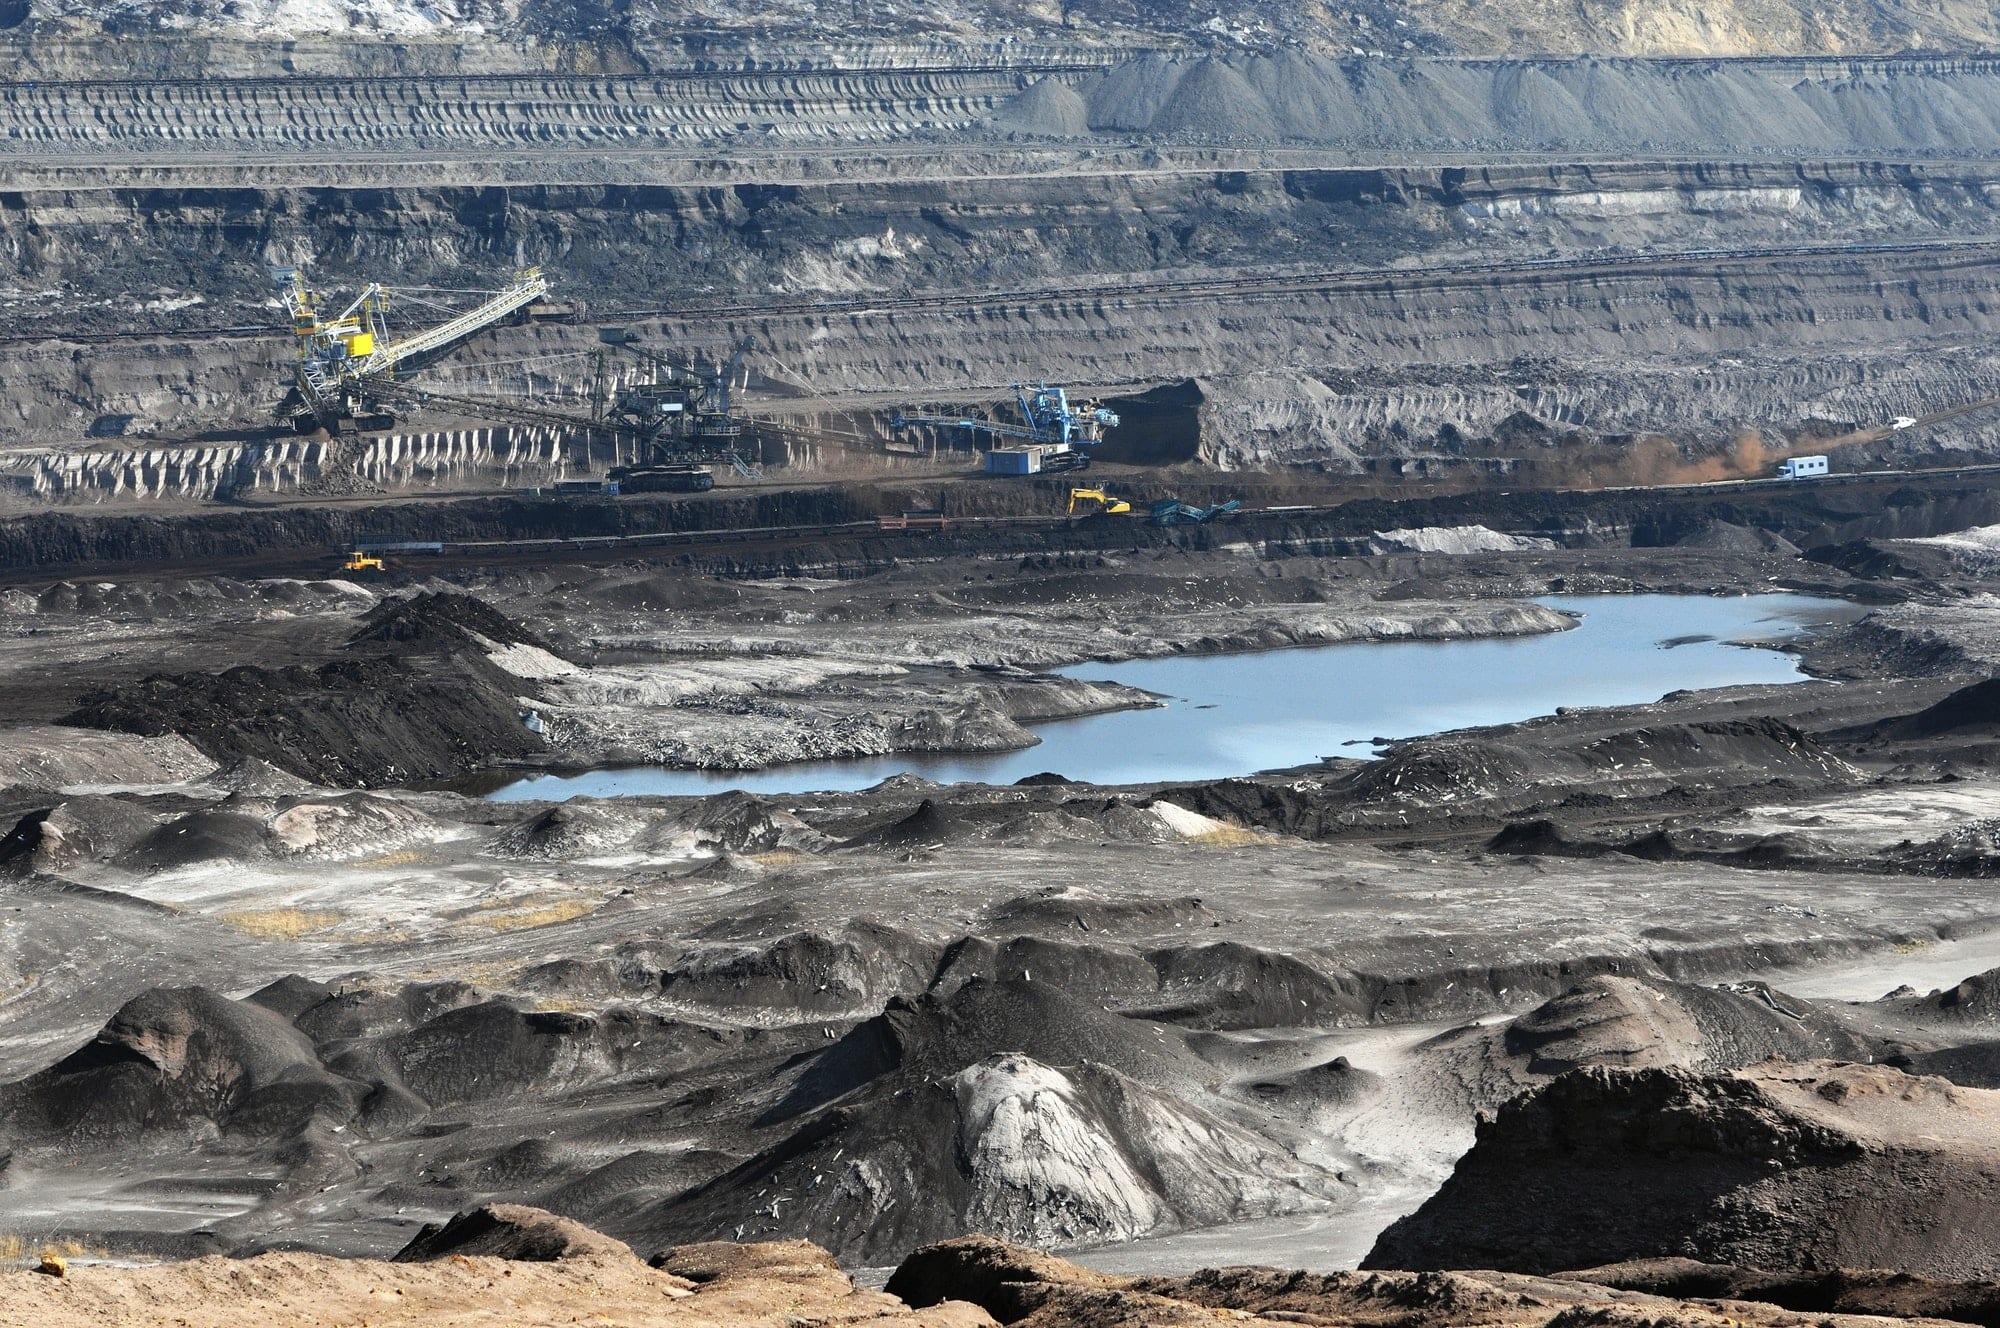 coal mine with a Bucket-wheel excavator